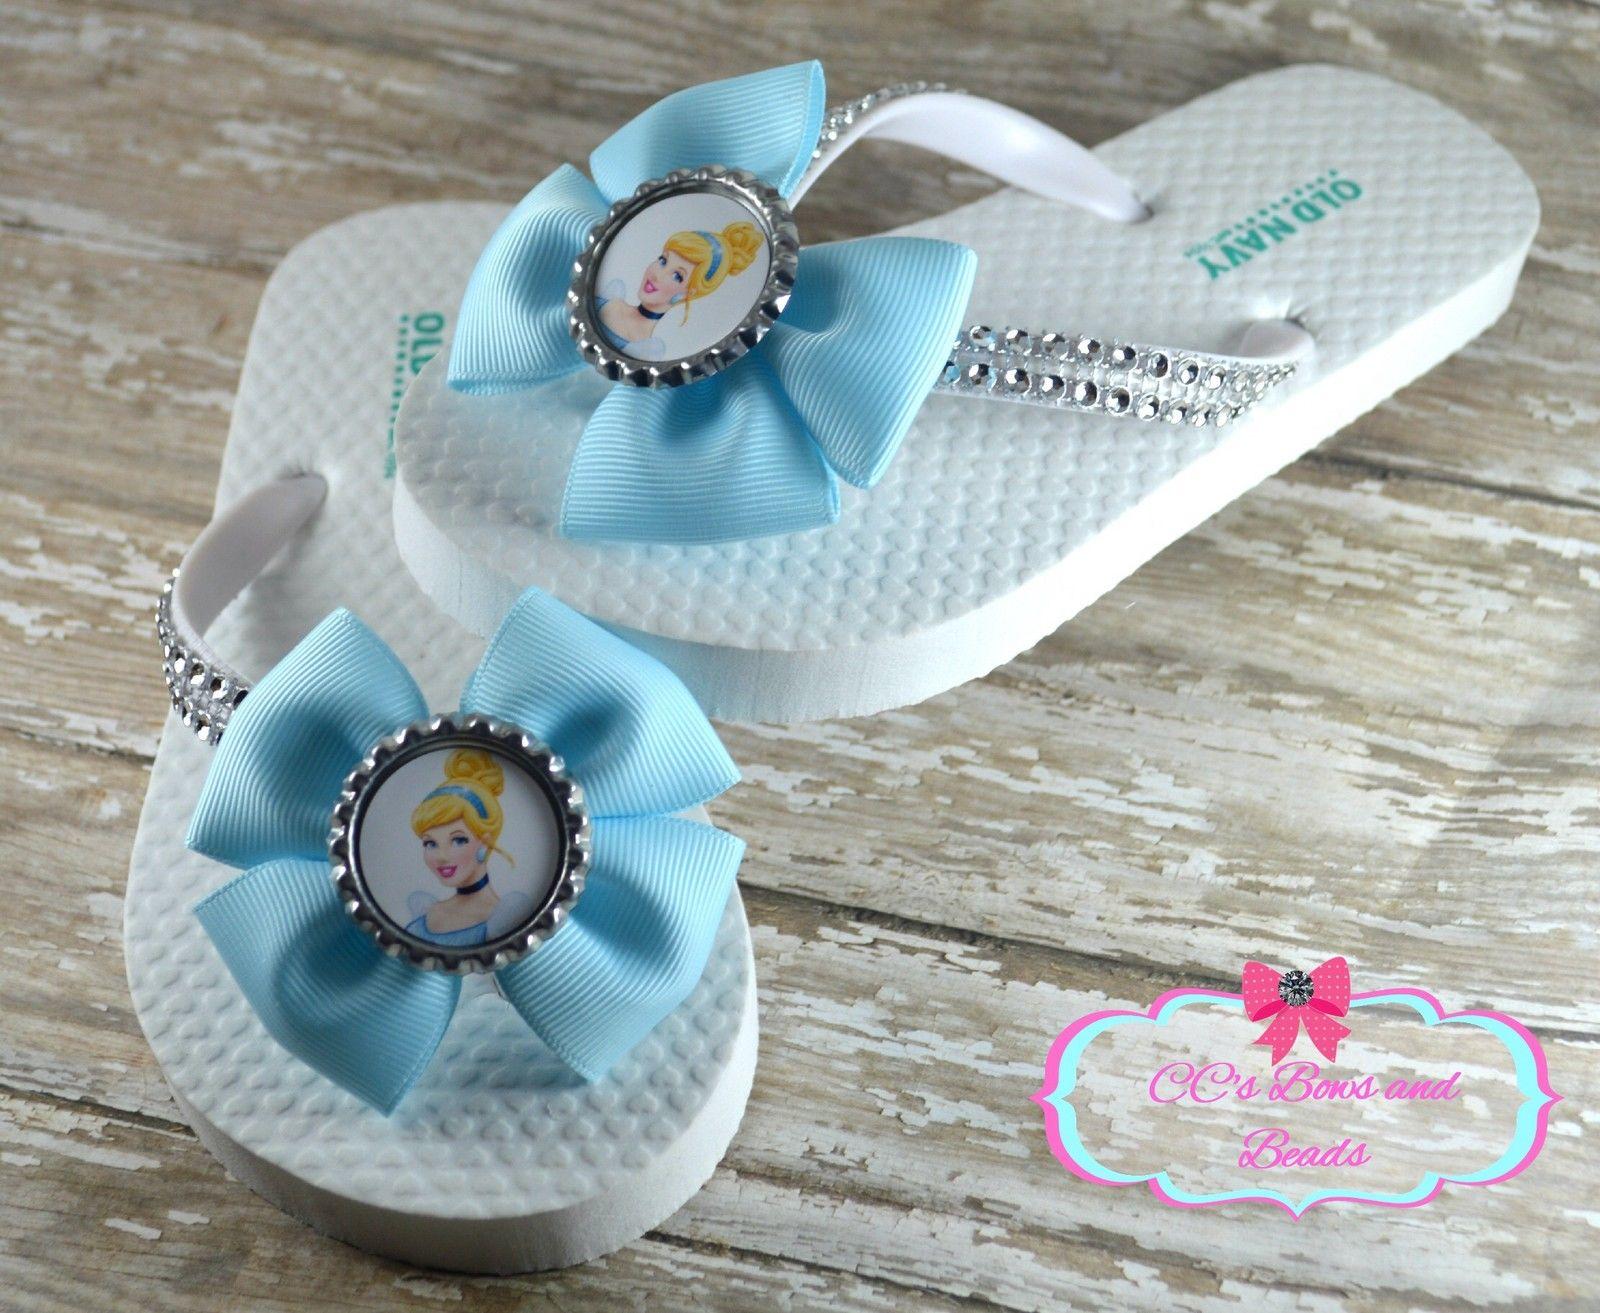 c2d2ff0bc5dc Disney s Cinderella Flip Flops Sandals White Old Navy Rubber Summer ...